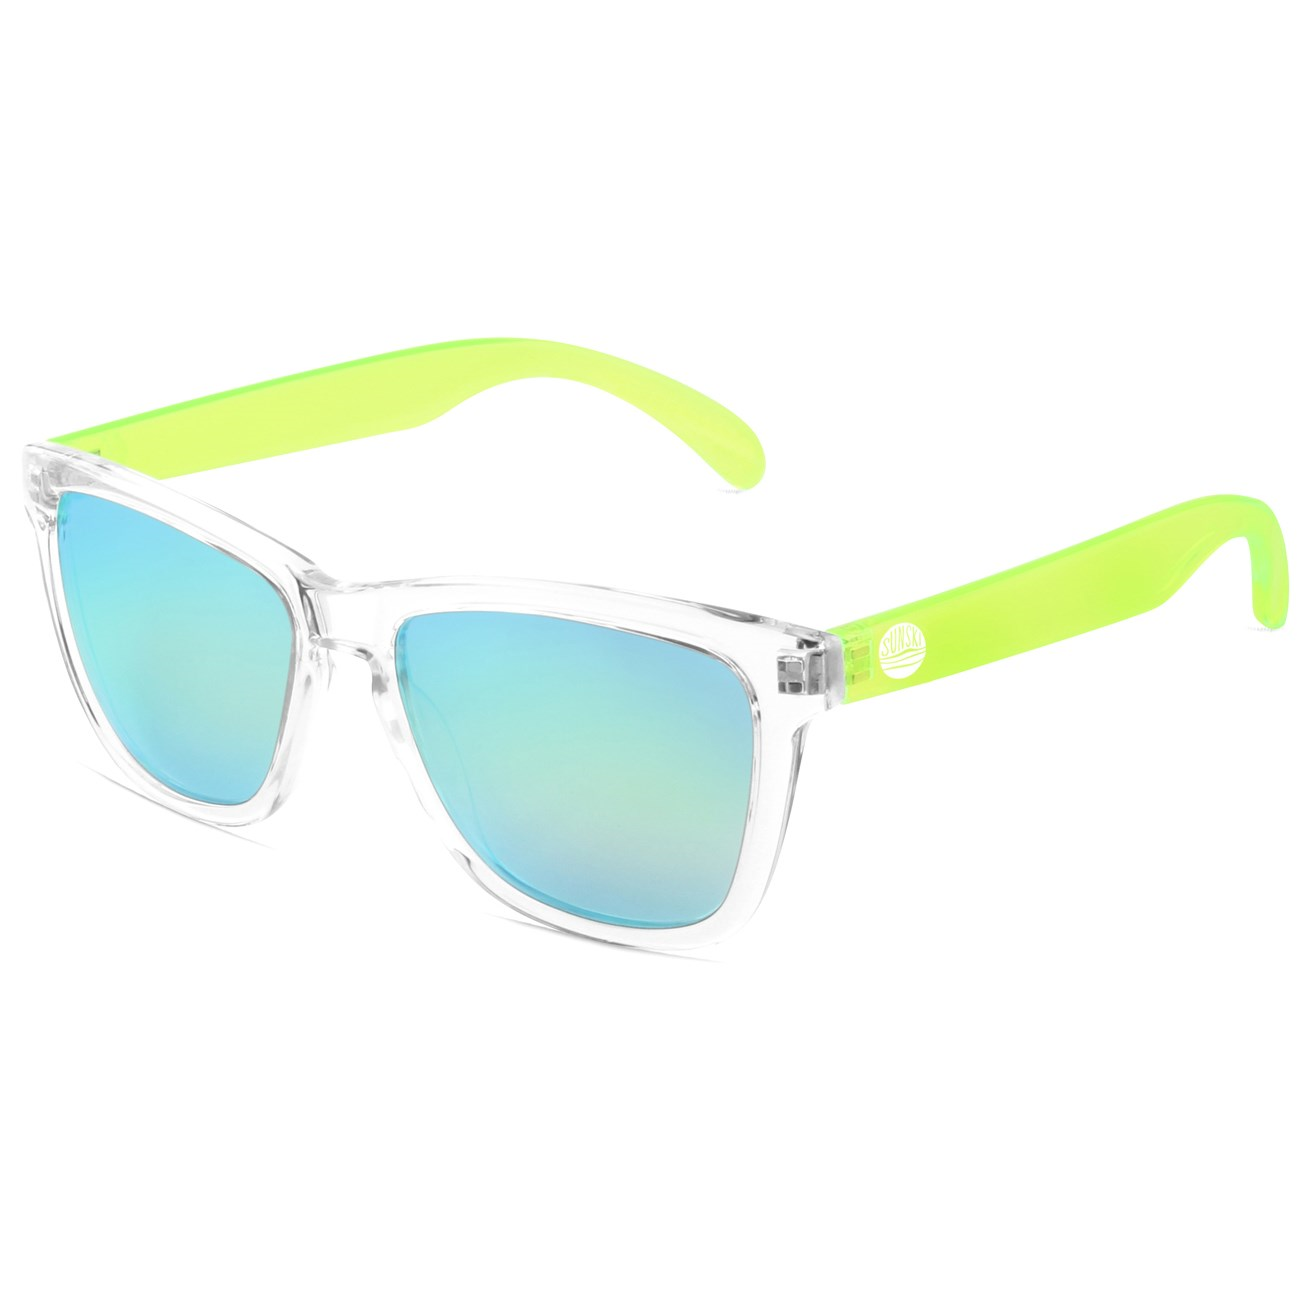 SUNSKI – Γυαλιά ηλίου SUNSKI διάφανα-lime